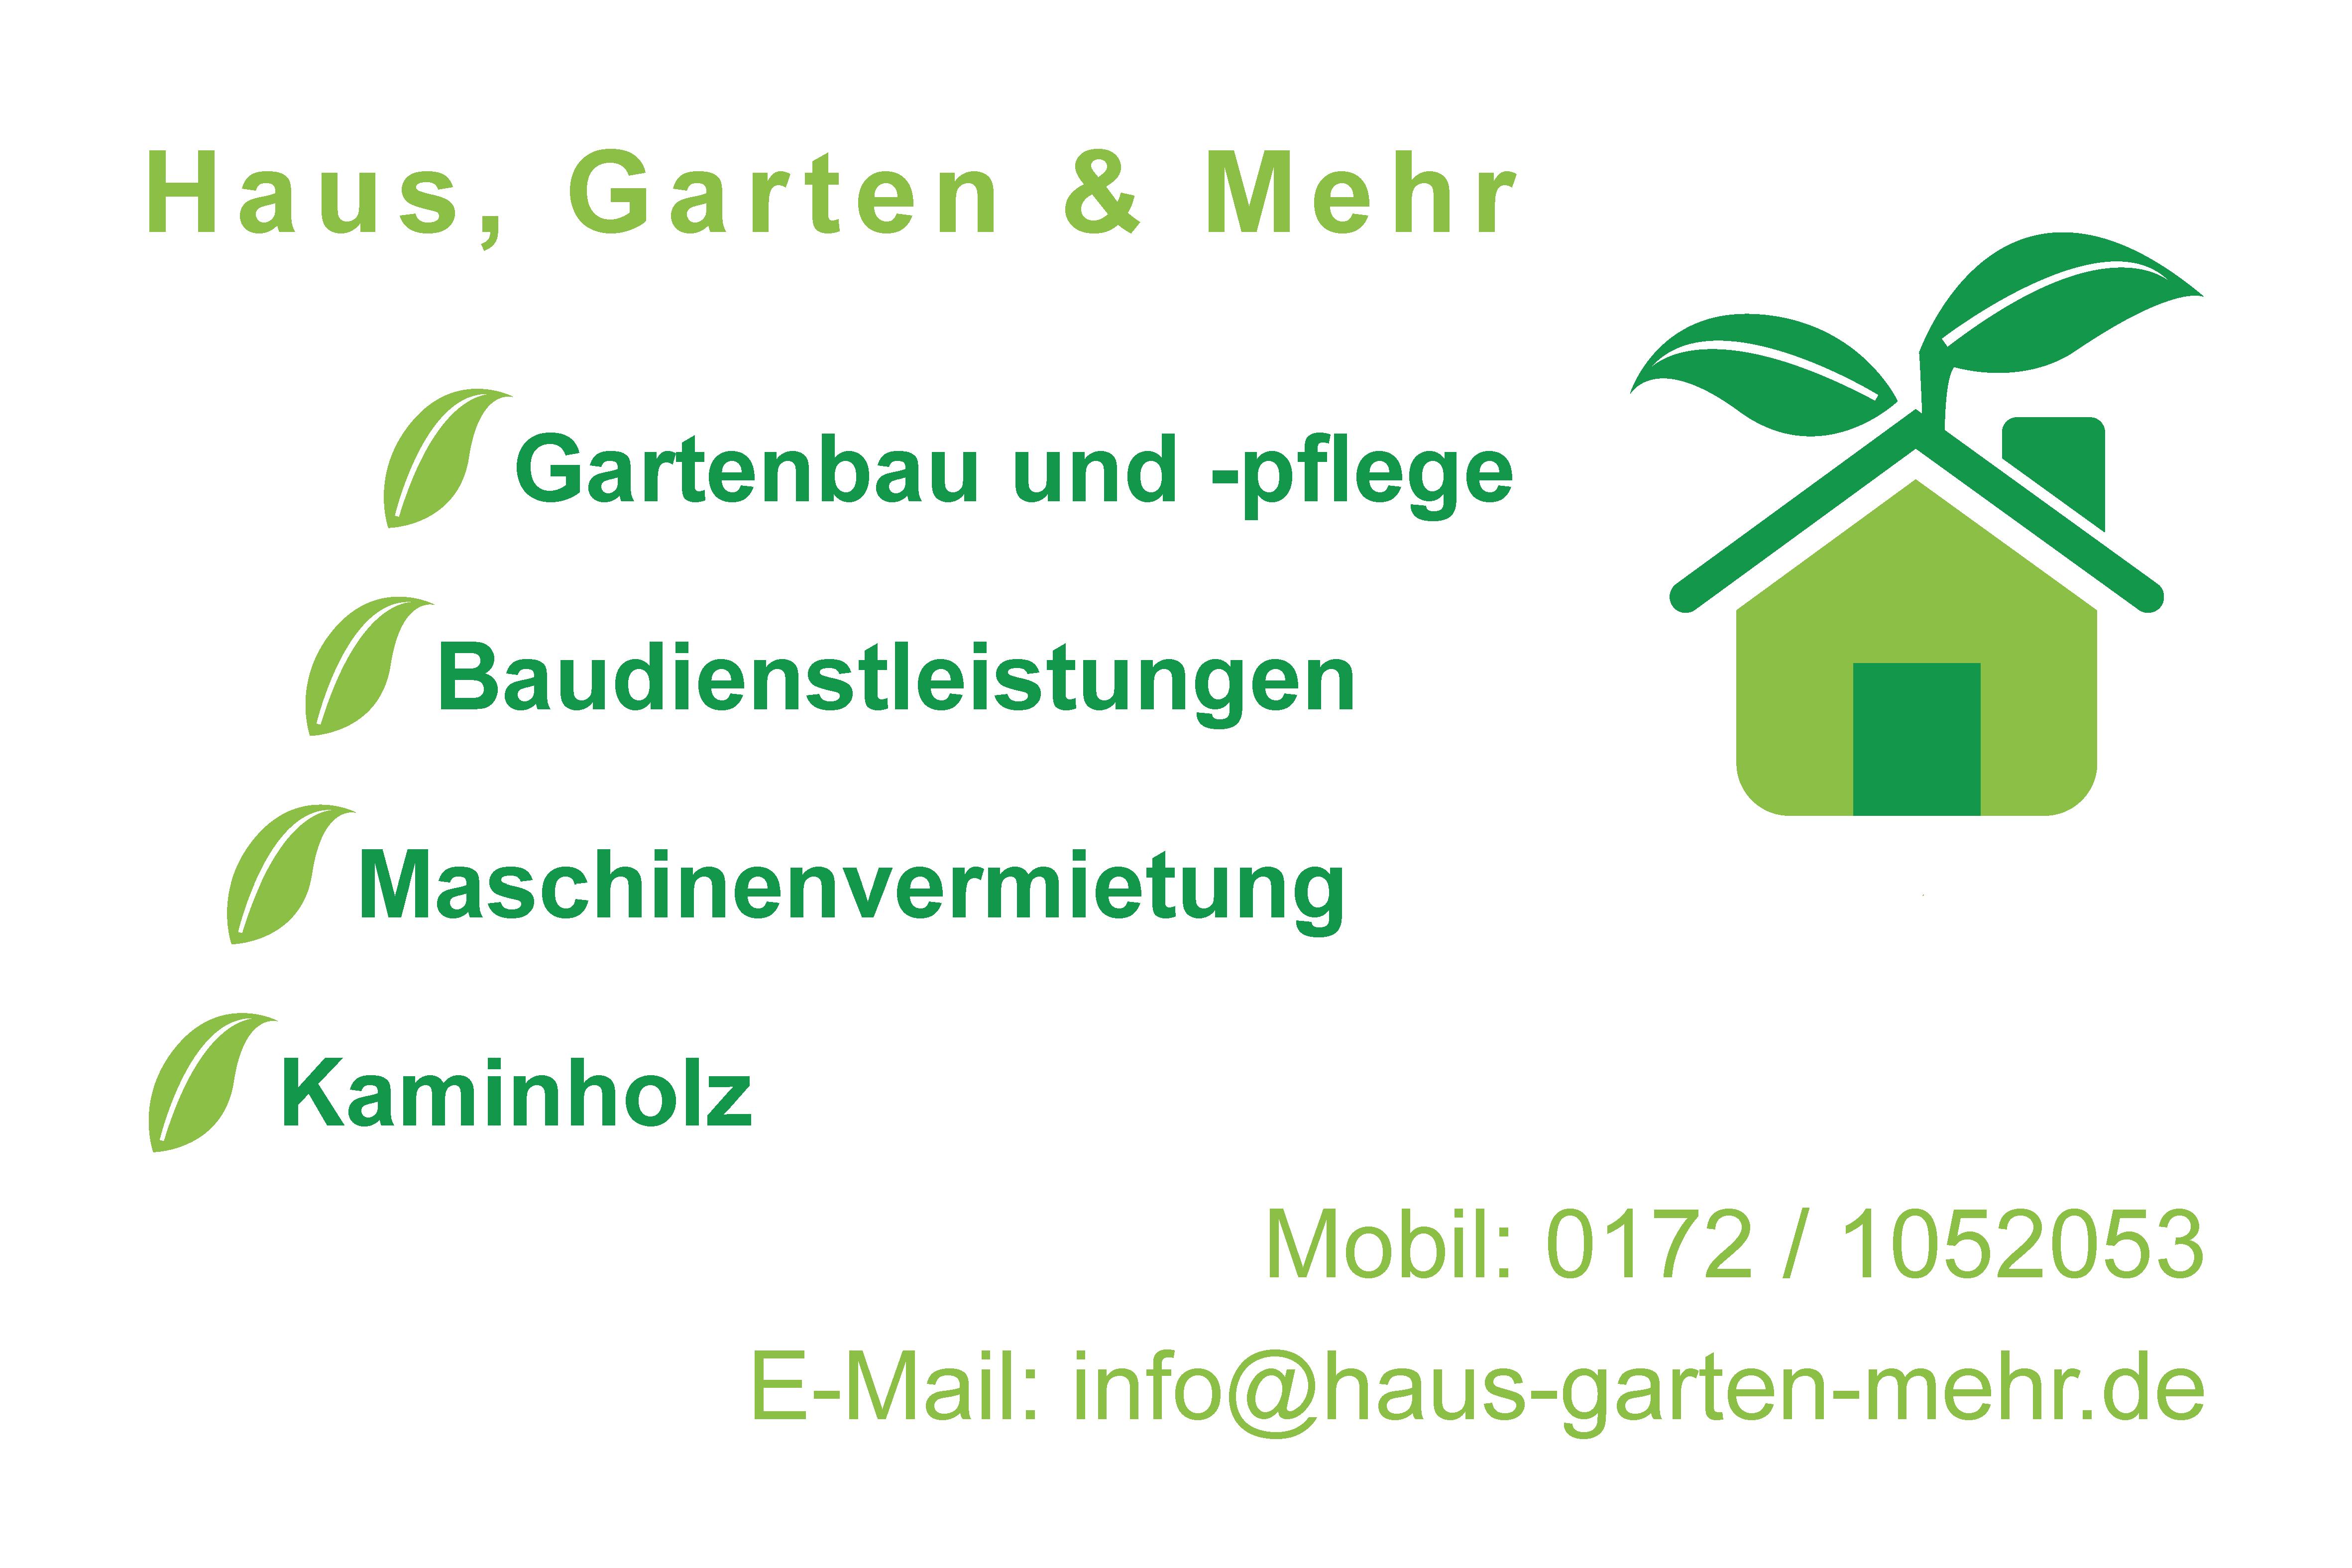 Haus, Garten & Mehr